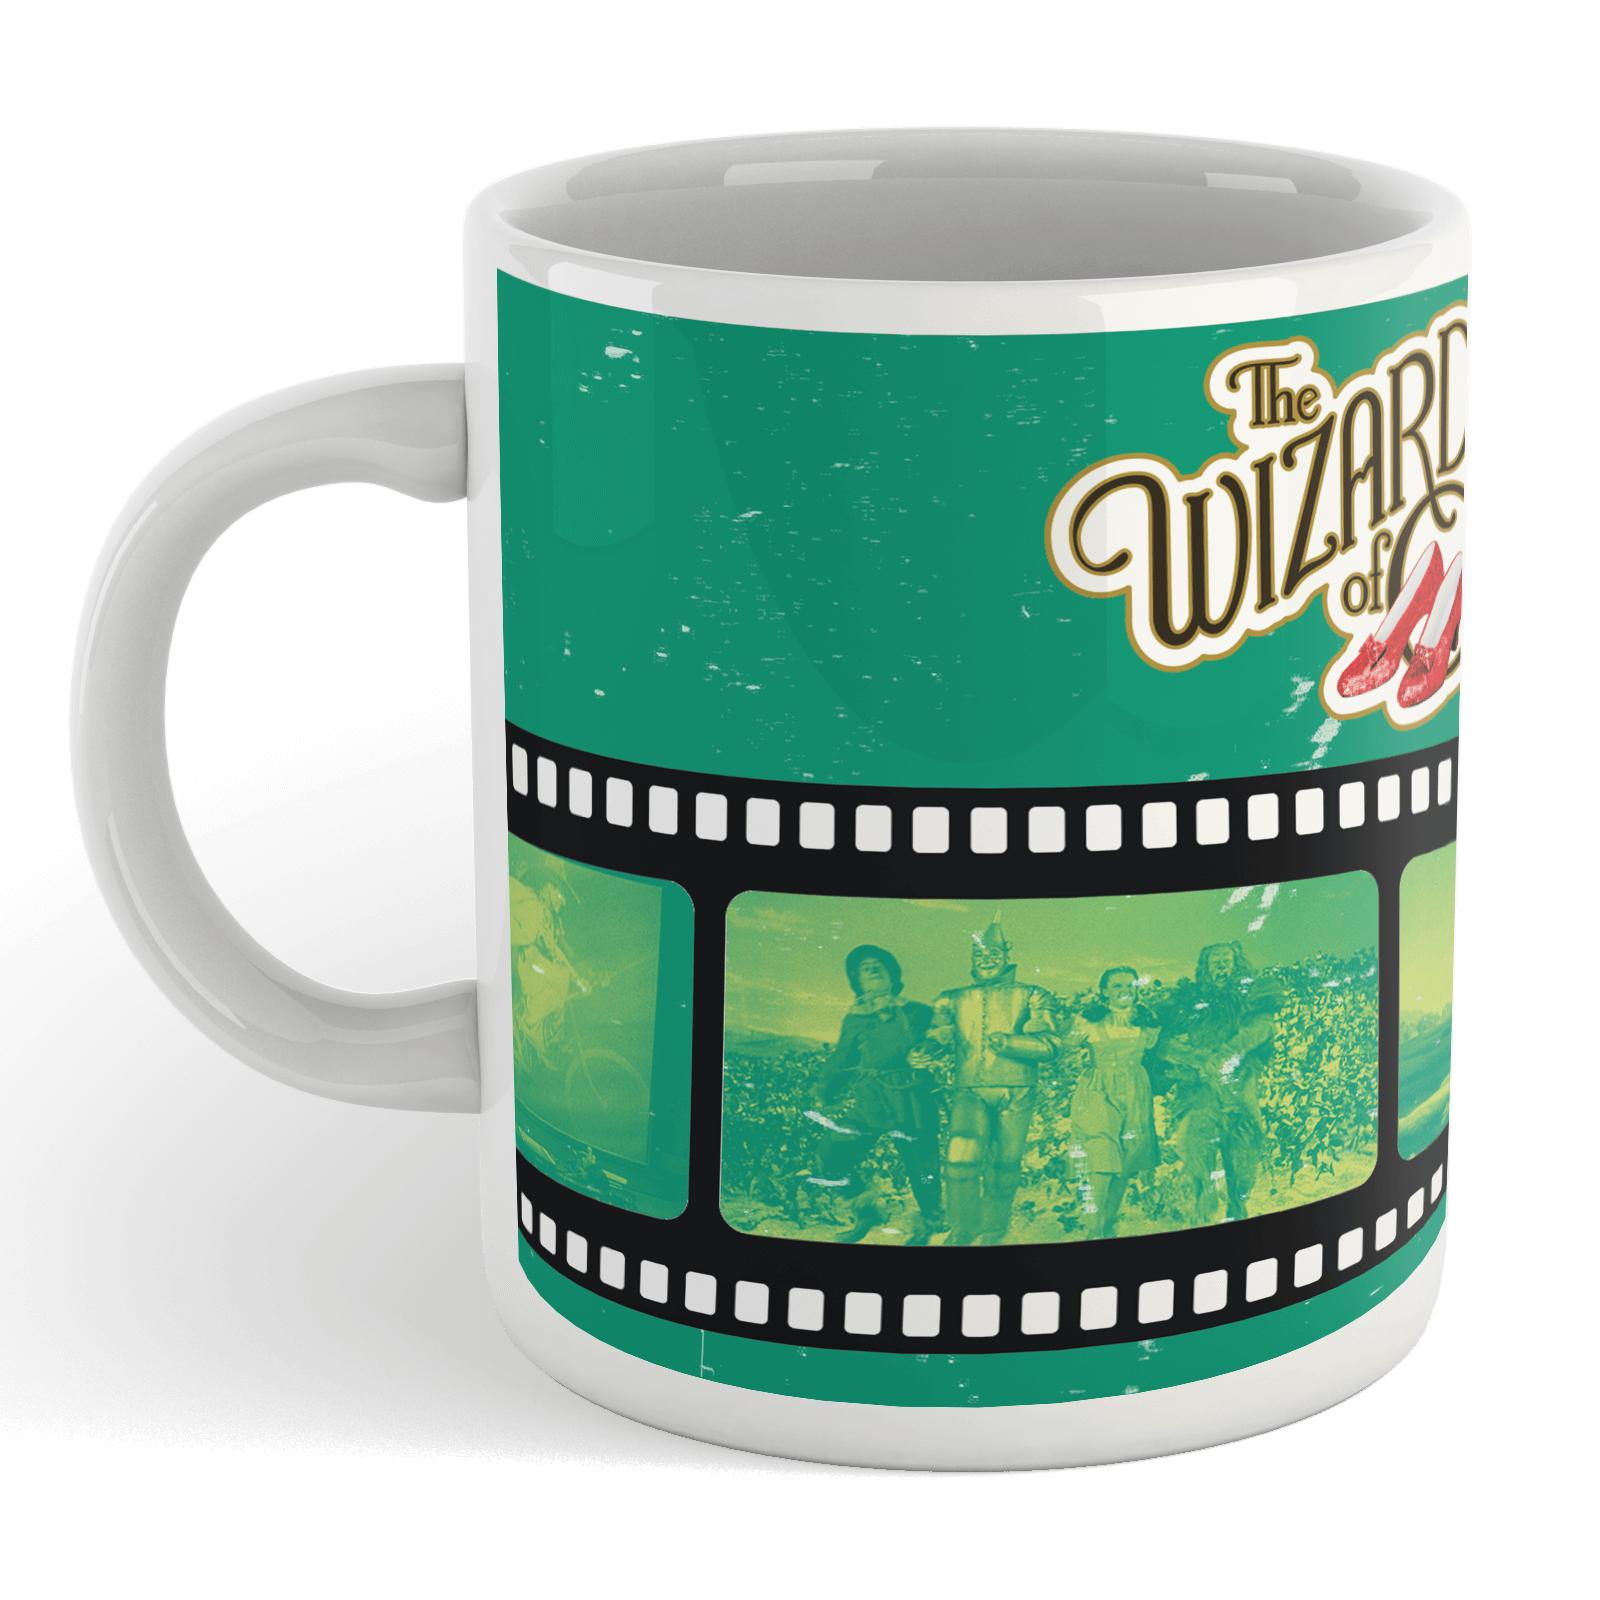 Wizard of Oz Reel Mug